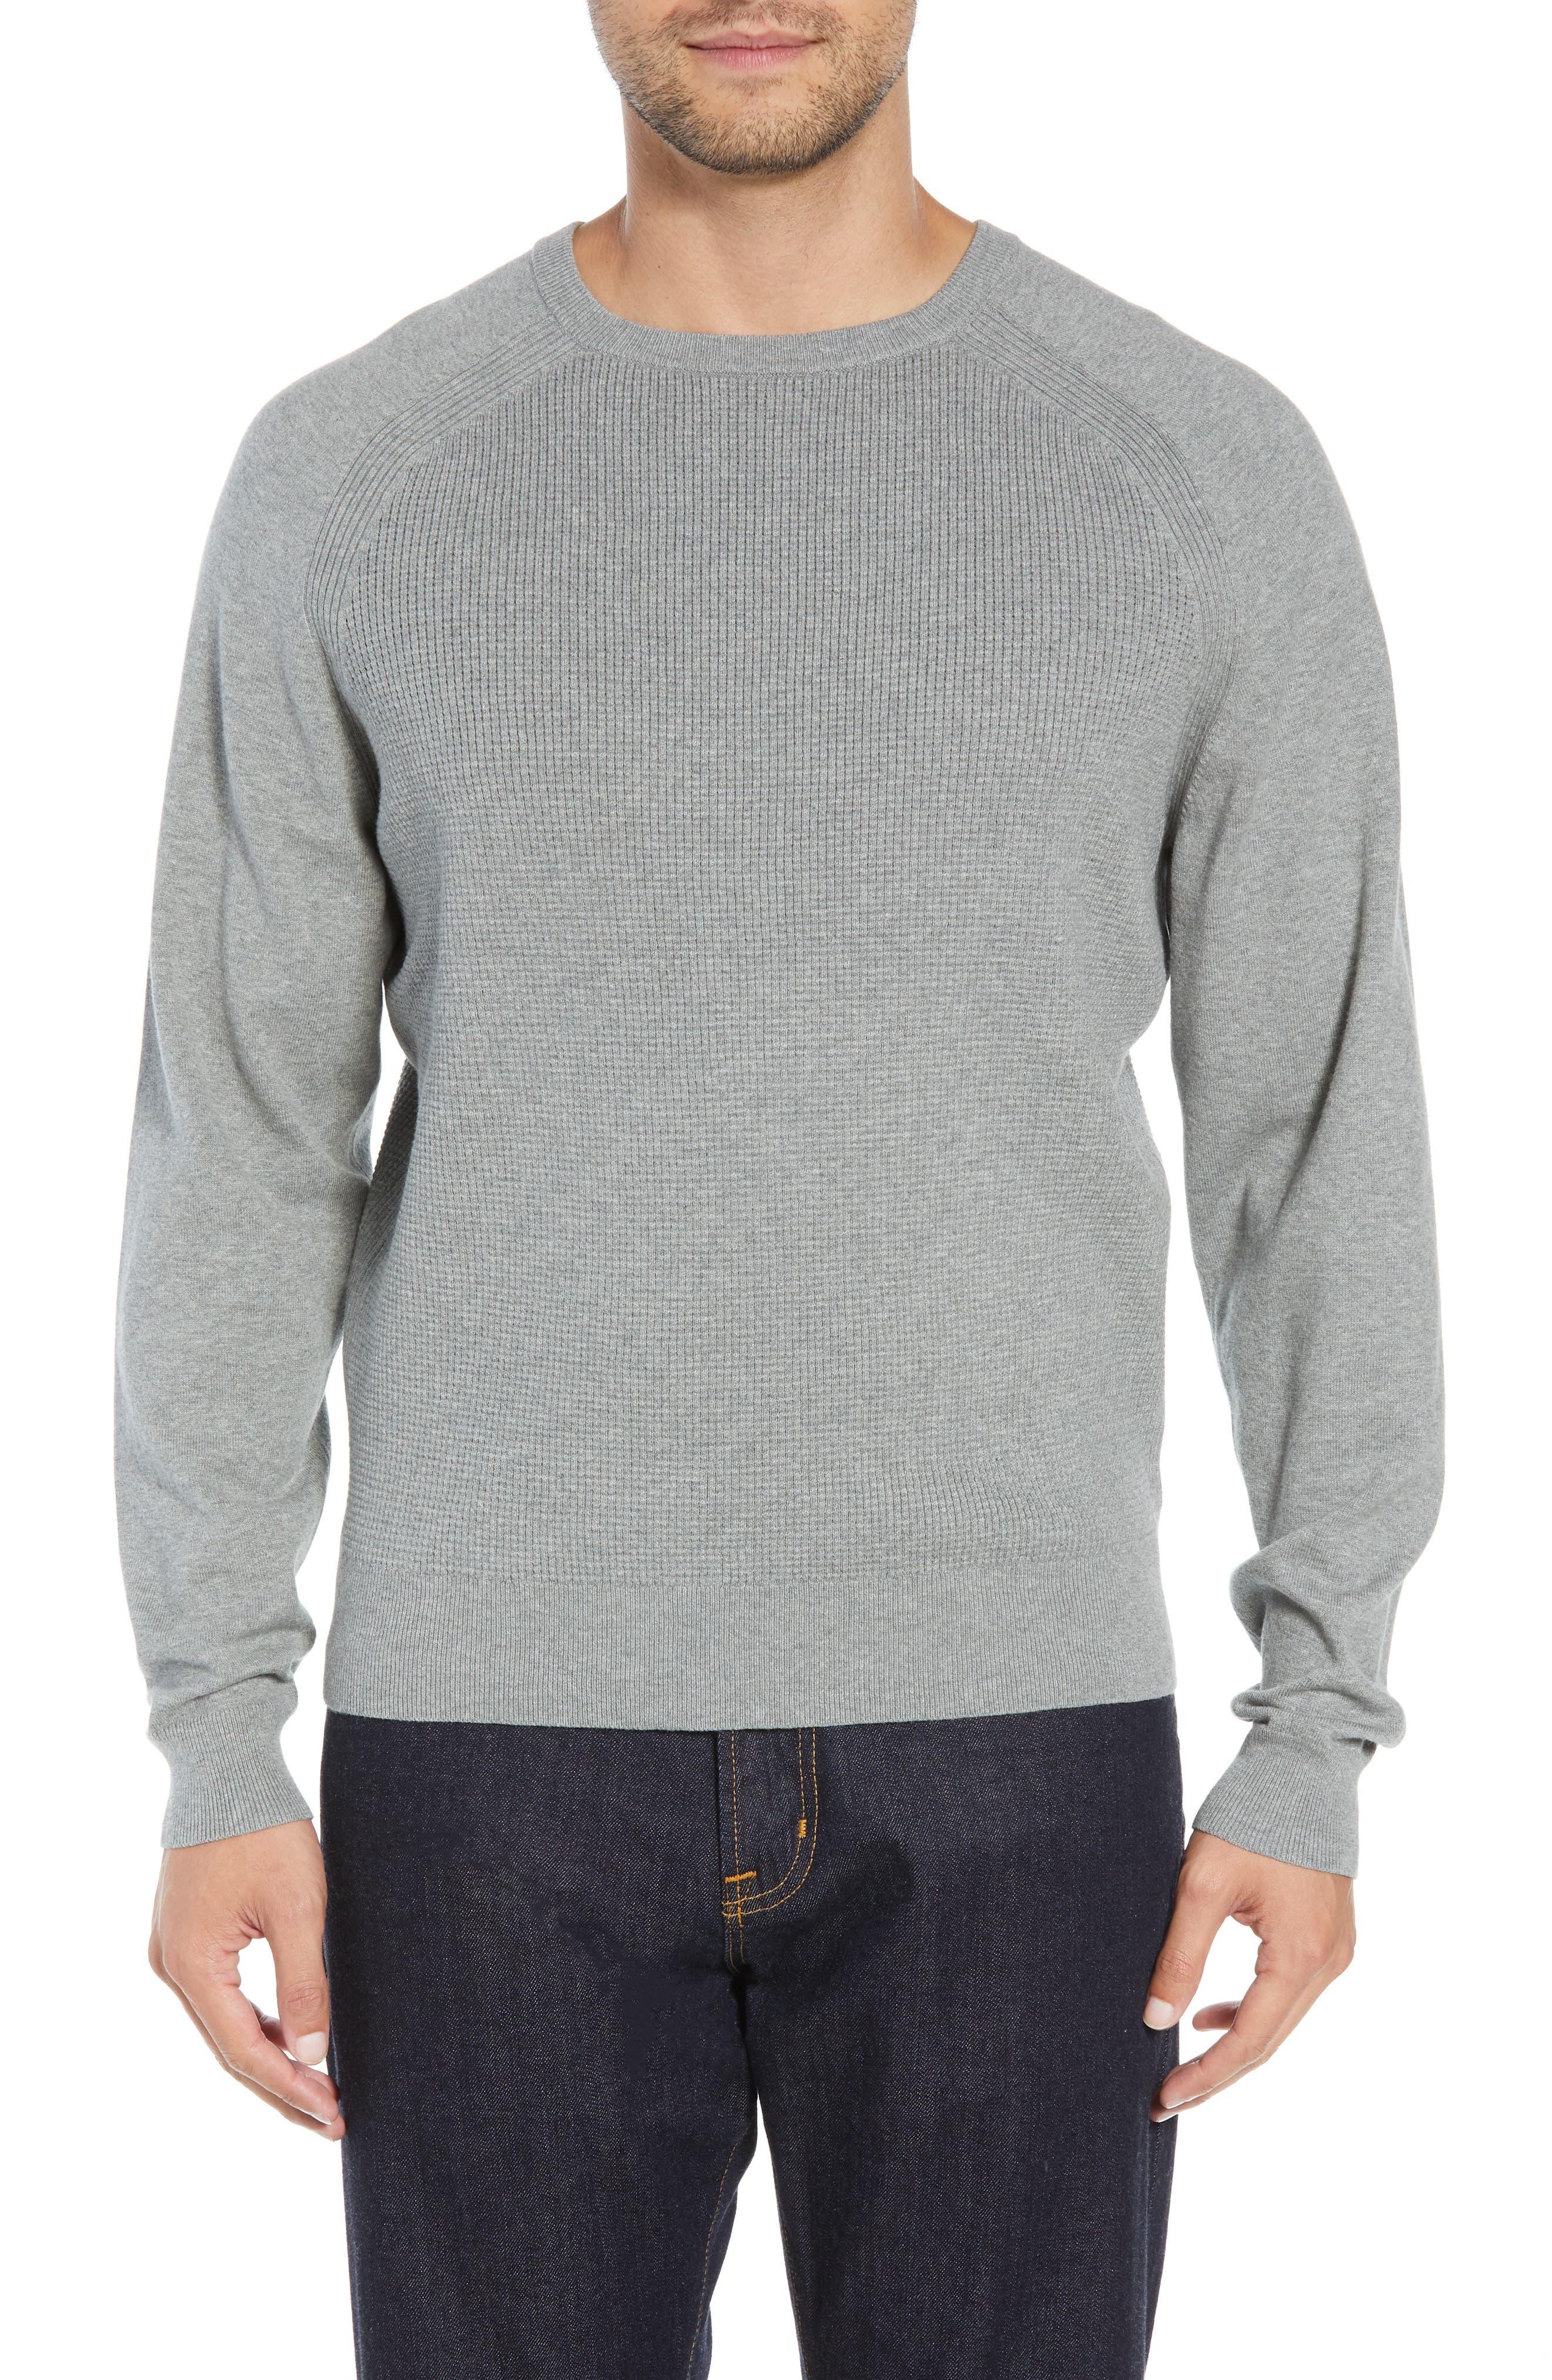 Big & Tall Cutter & Buck Lakemon Mix Crewneck Sweater, Grey